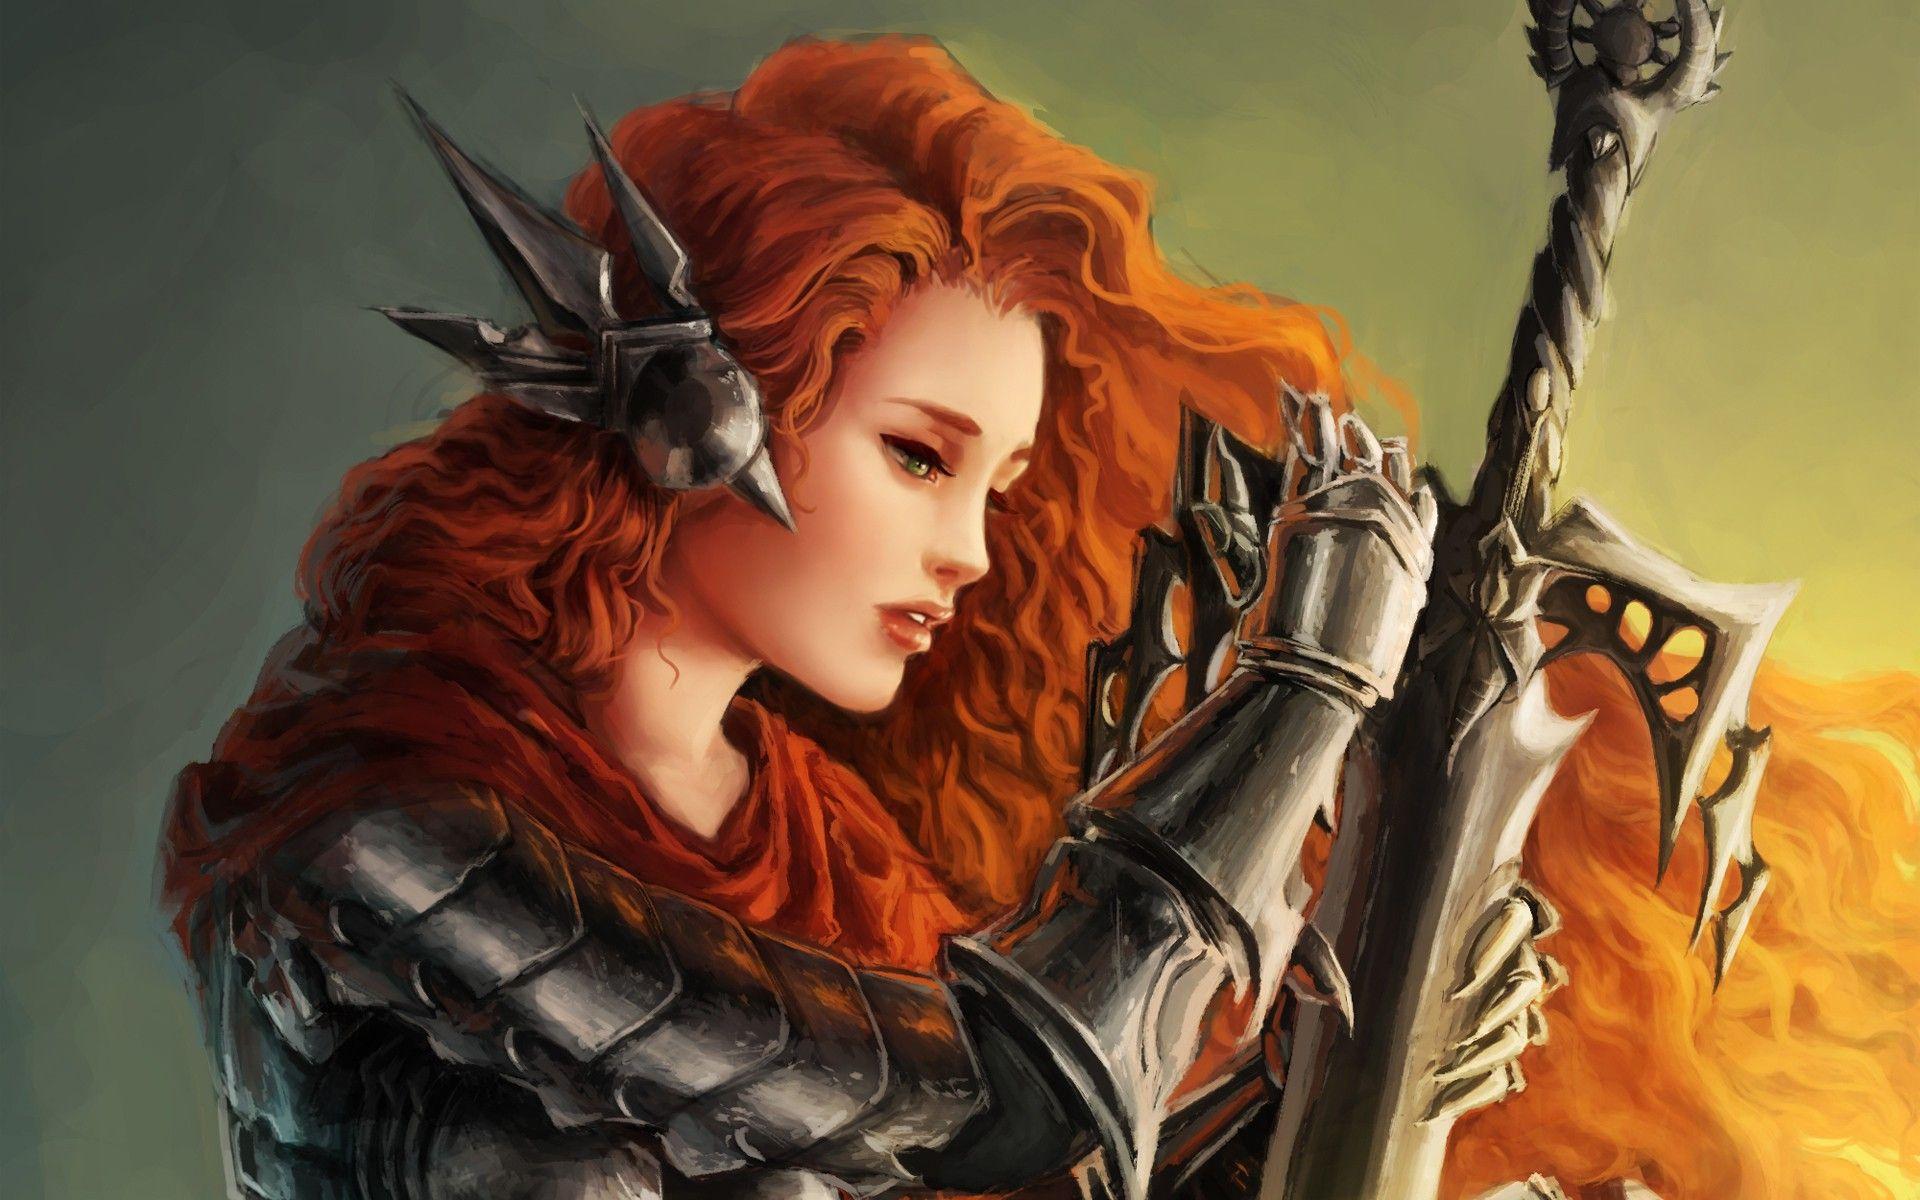 girl-redhead-warrior-woman-image-pregnant-girl